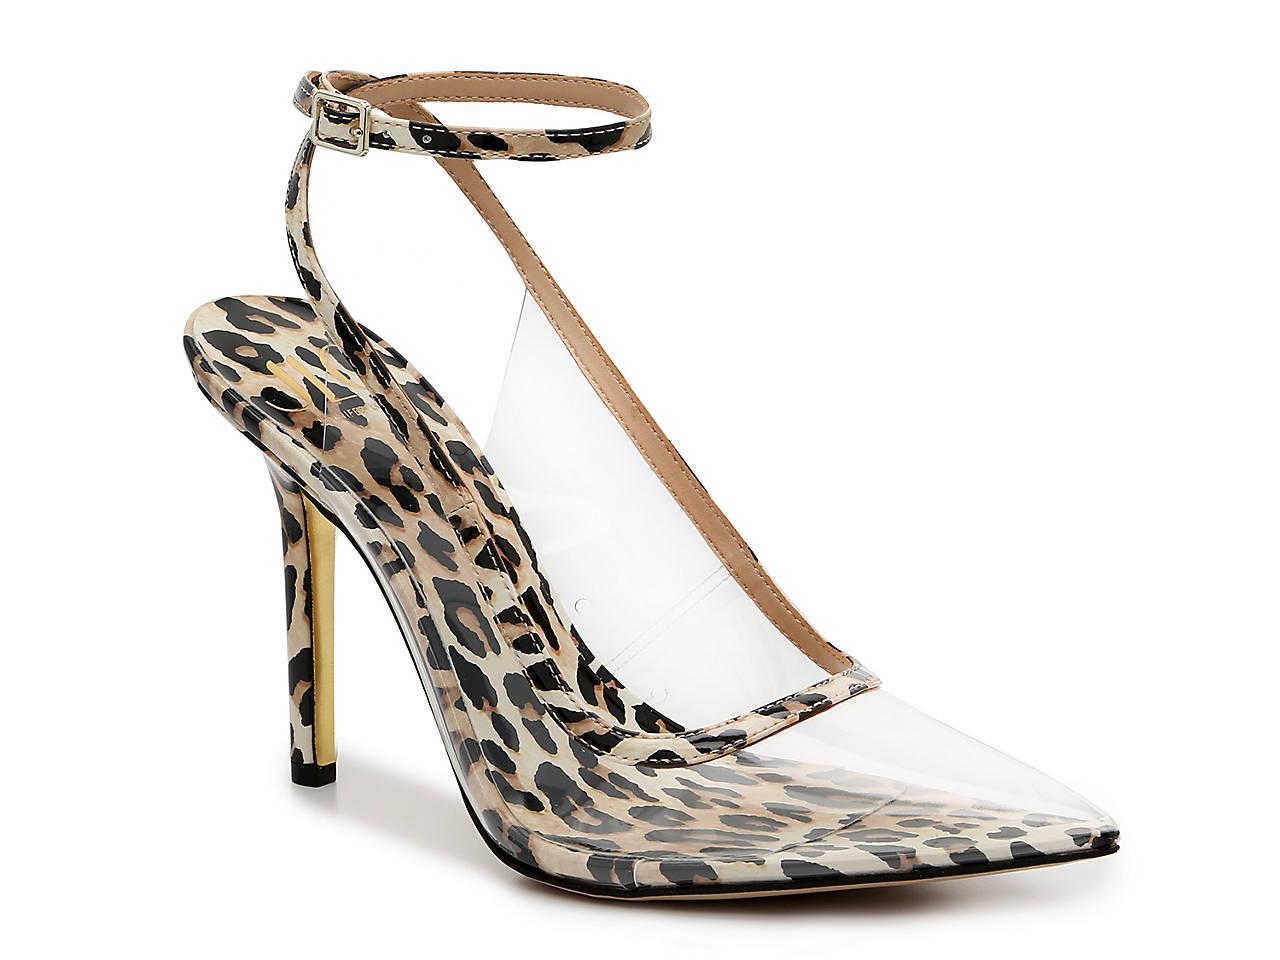 Jennifer Lopez's DSW Shoe Collection Is